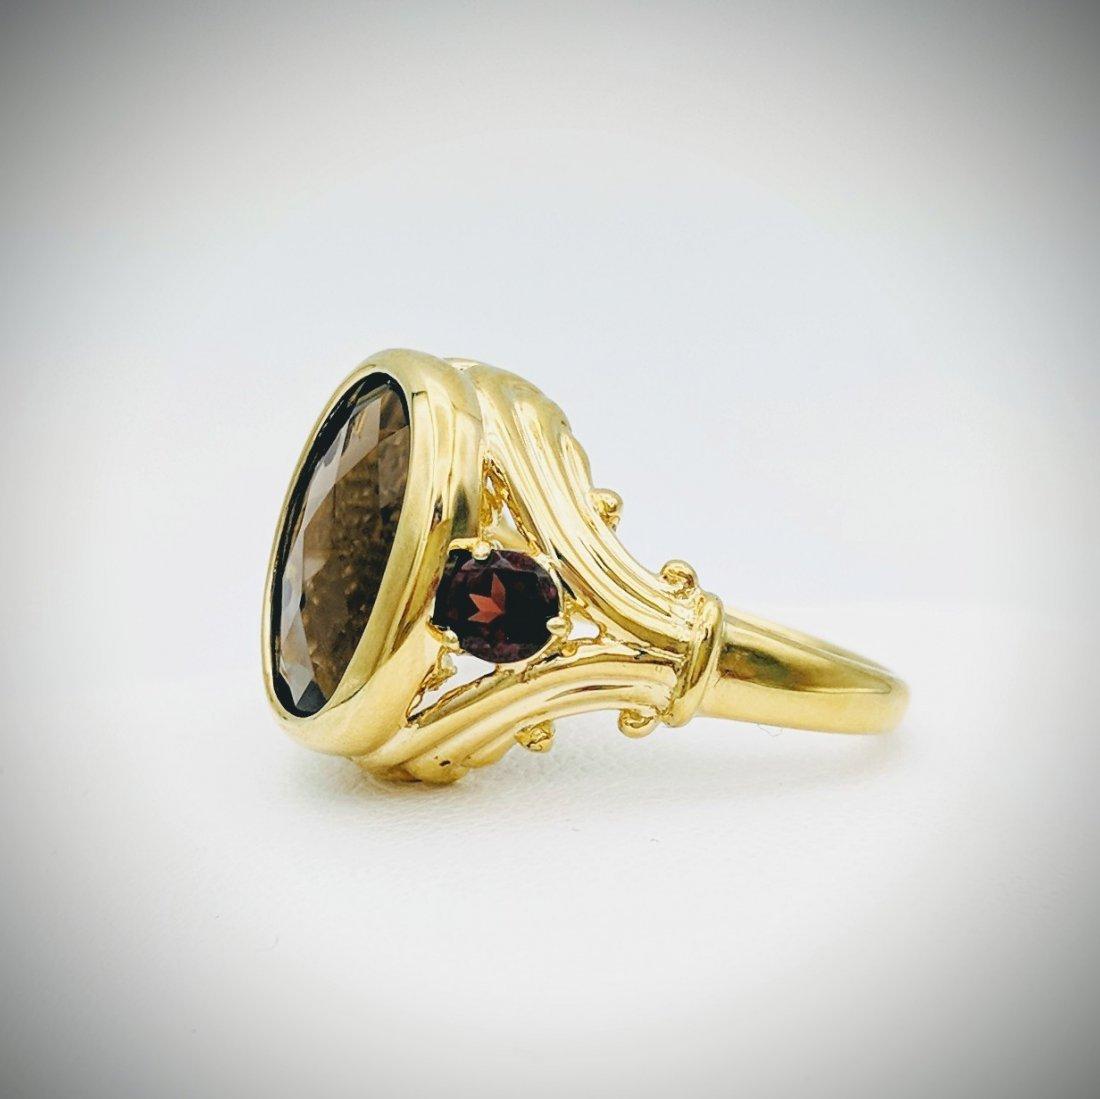 Gold Plated Sterling Silver Smoky Quartz Garnet Ring - 2